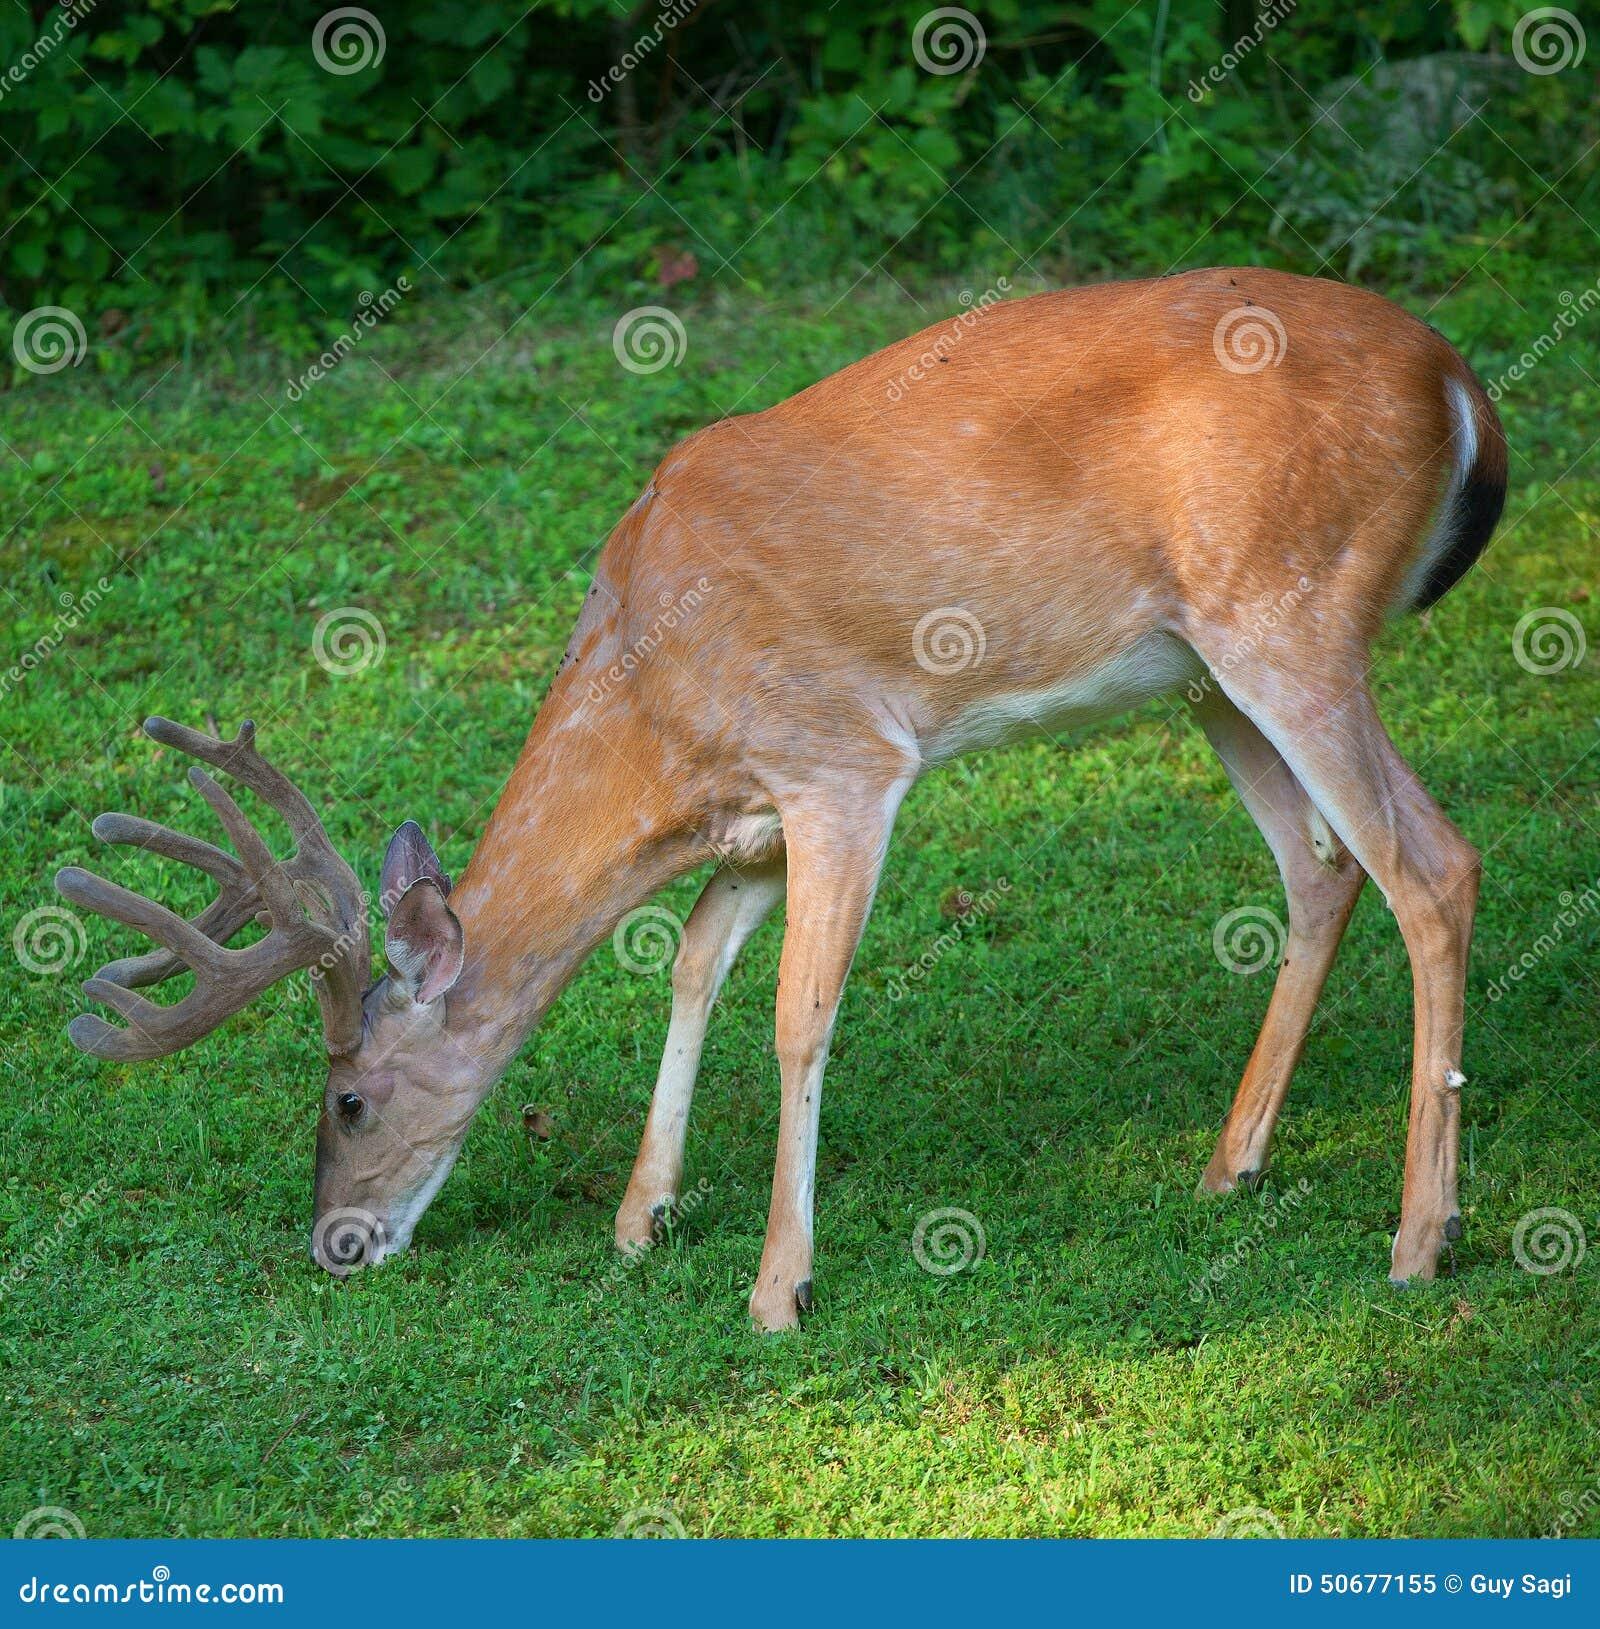 Download 饥饿的鹿 库存图片. 图片 包括有 天鹅绒, 野生生物, 头发, 眼睛, browne, 毛皮, 题头, 敌意 - 50677155